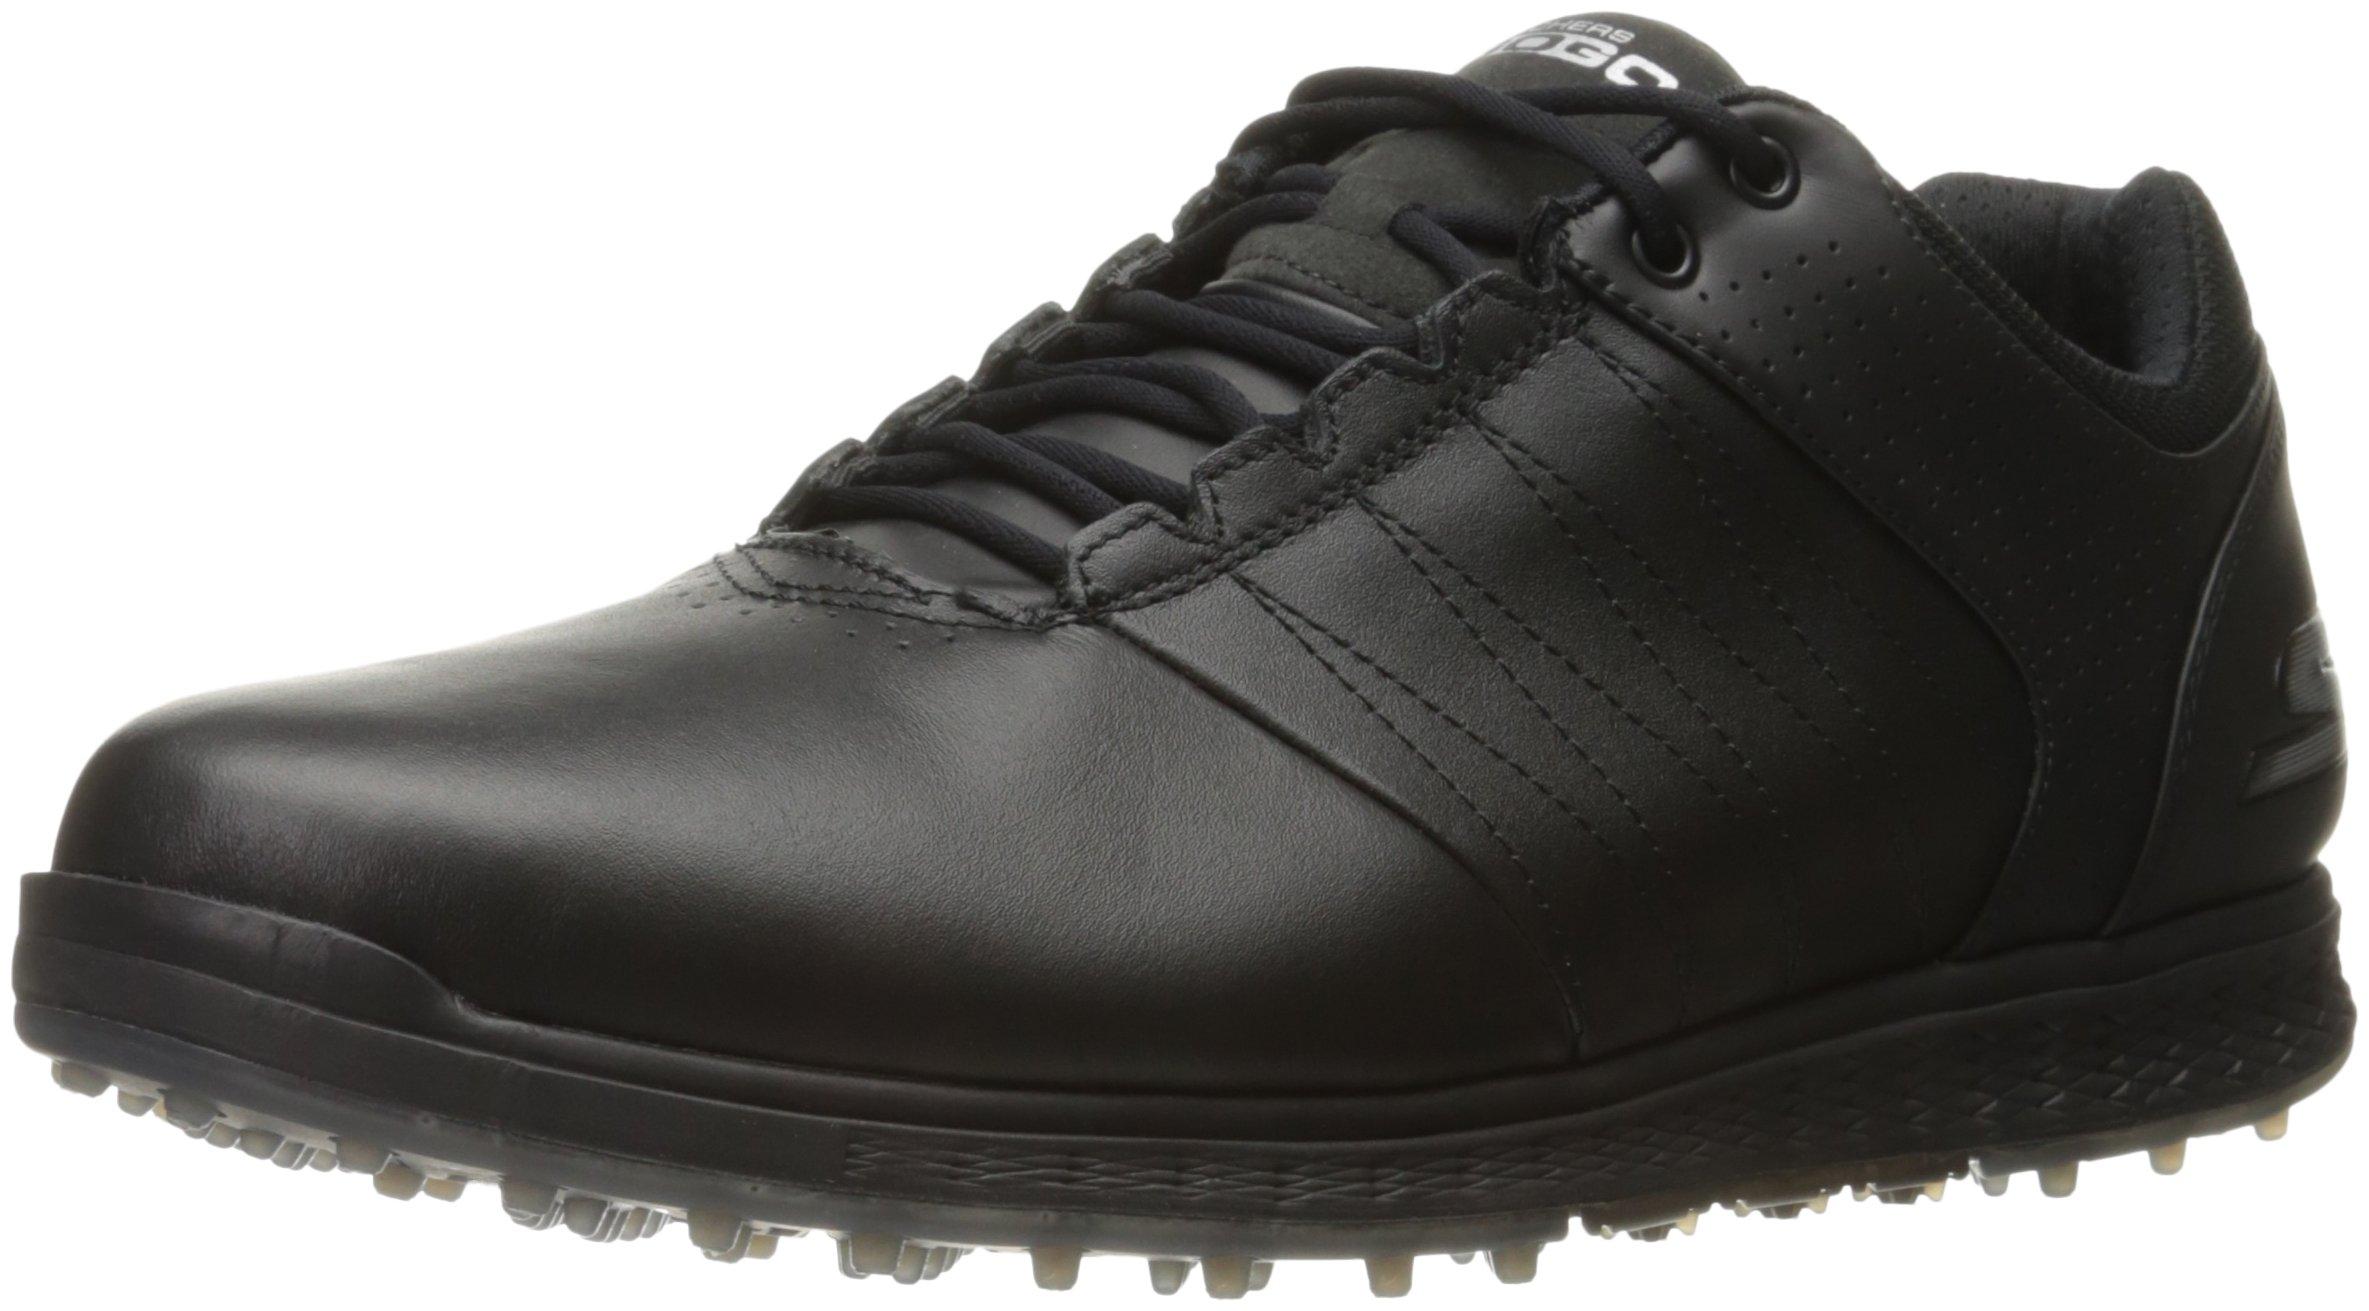 Skechers Performance Men's Go Golf Elite 2 Golf Shoe,Black,10.5 M US by Skechers